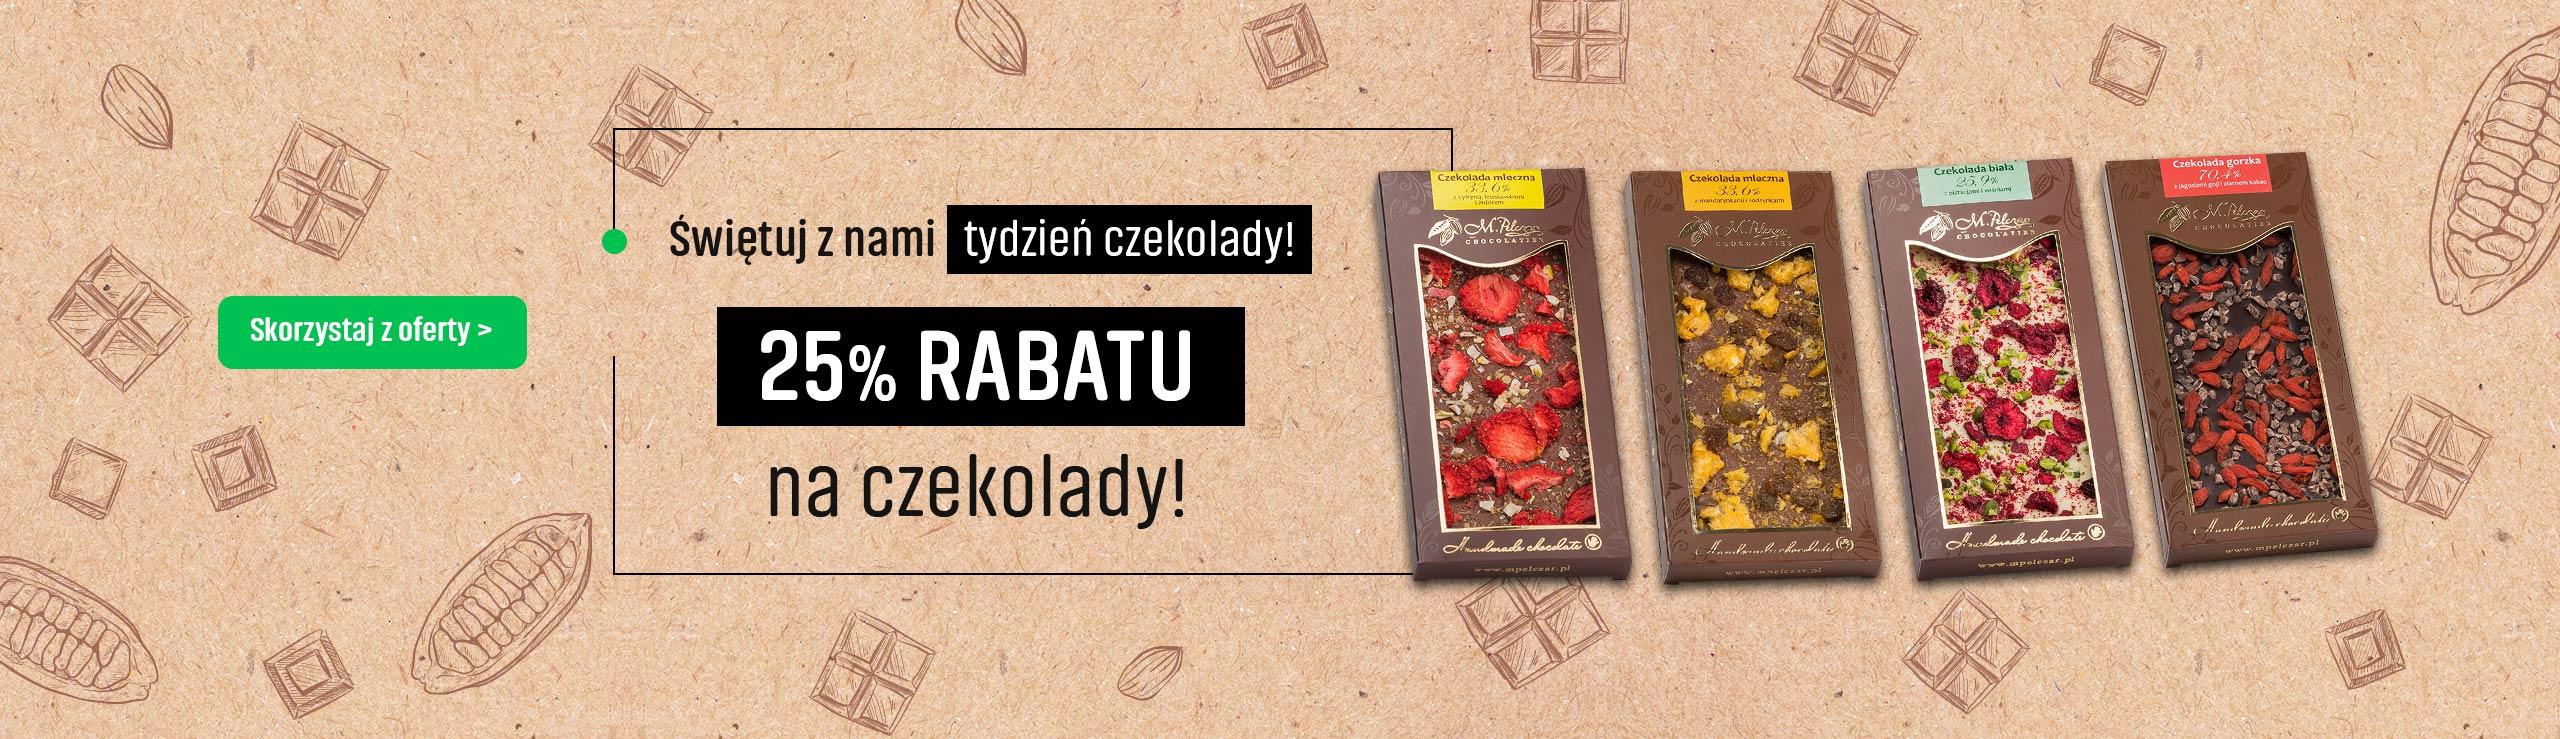 25% Rabatu na czekolady!